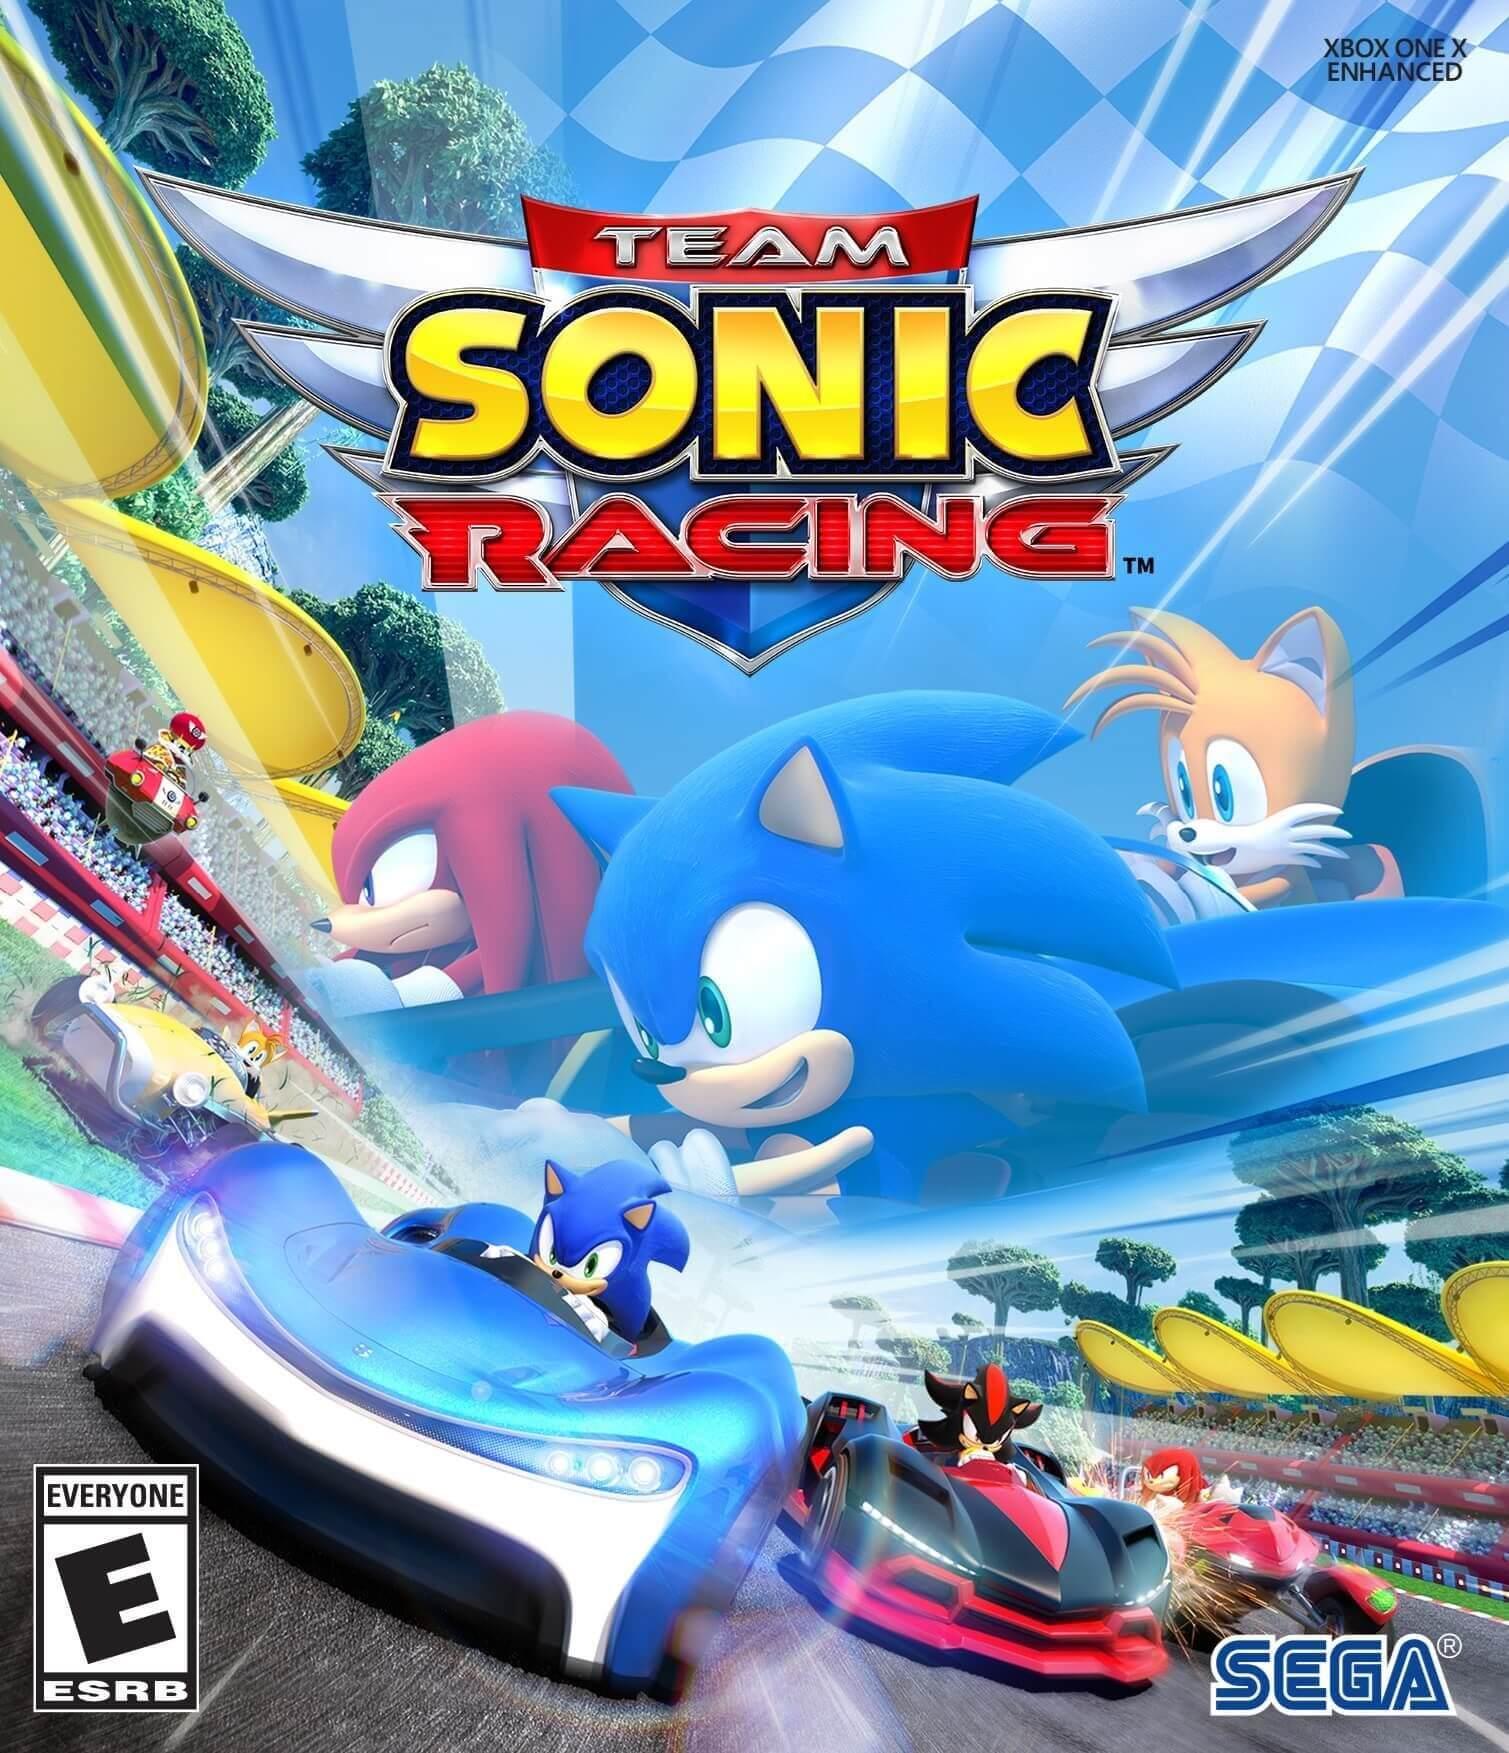 Immagine di Team Sonic Racing